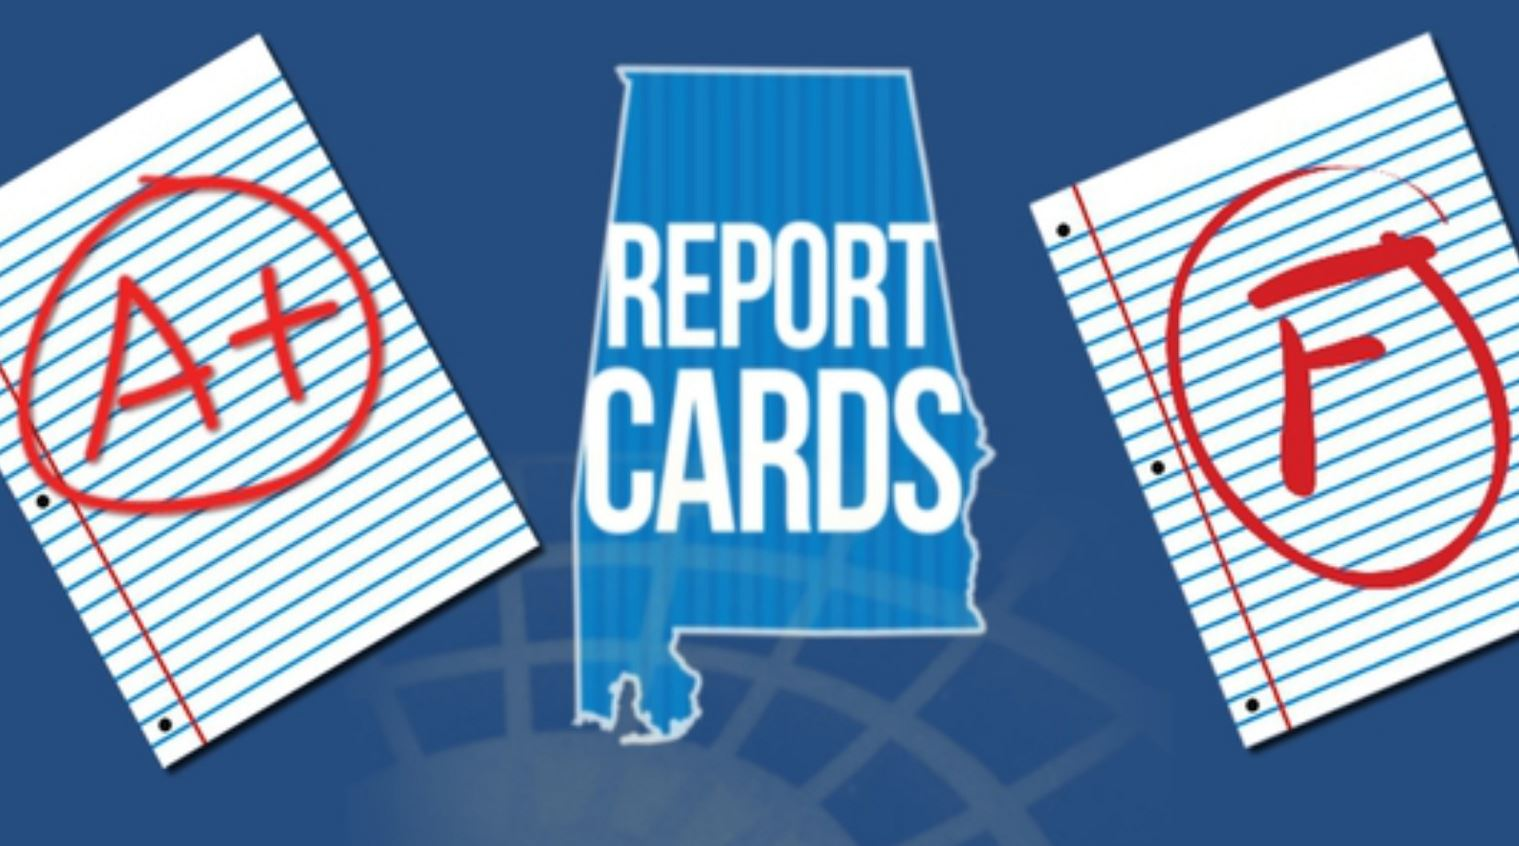 report cards_1546037062884.JPG.jpg